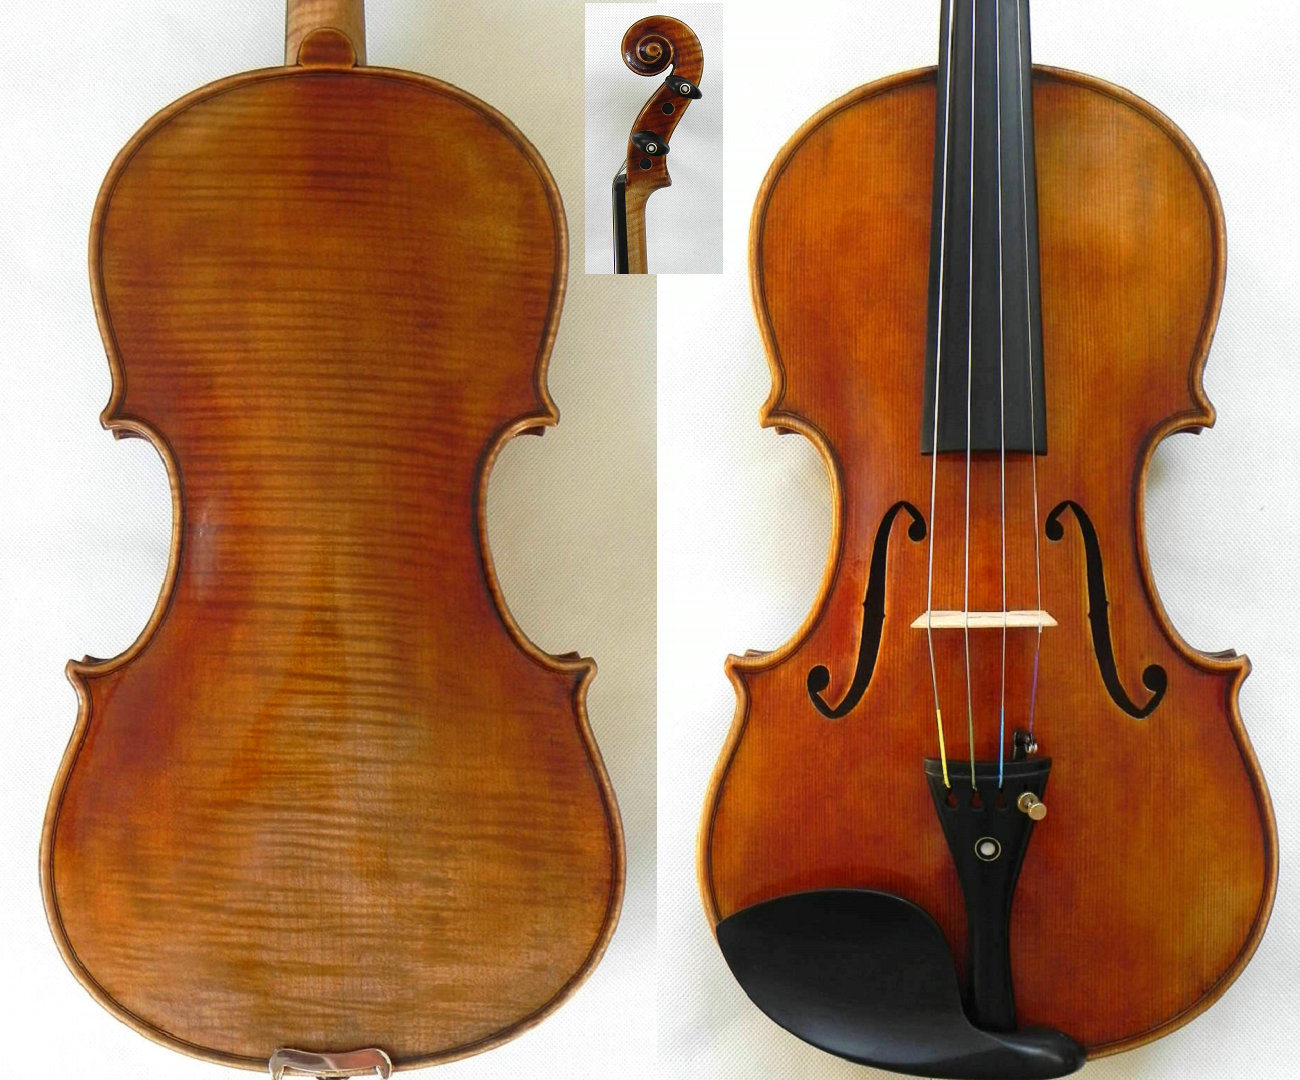 Old wood minerale interior of violin - Guarneri Del Gesu 1742 Cannone Violin Model Antiqued Varnish Nice Flame Back Violin Rh 600 China Violin 4 4 Hand Made Violin 4 4